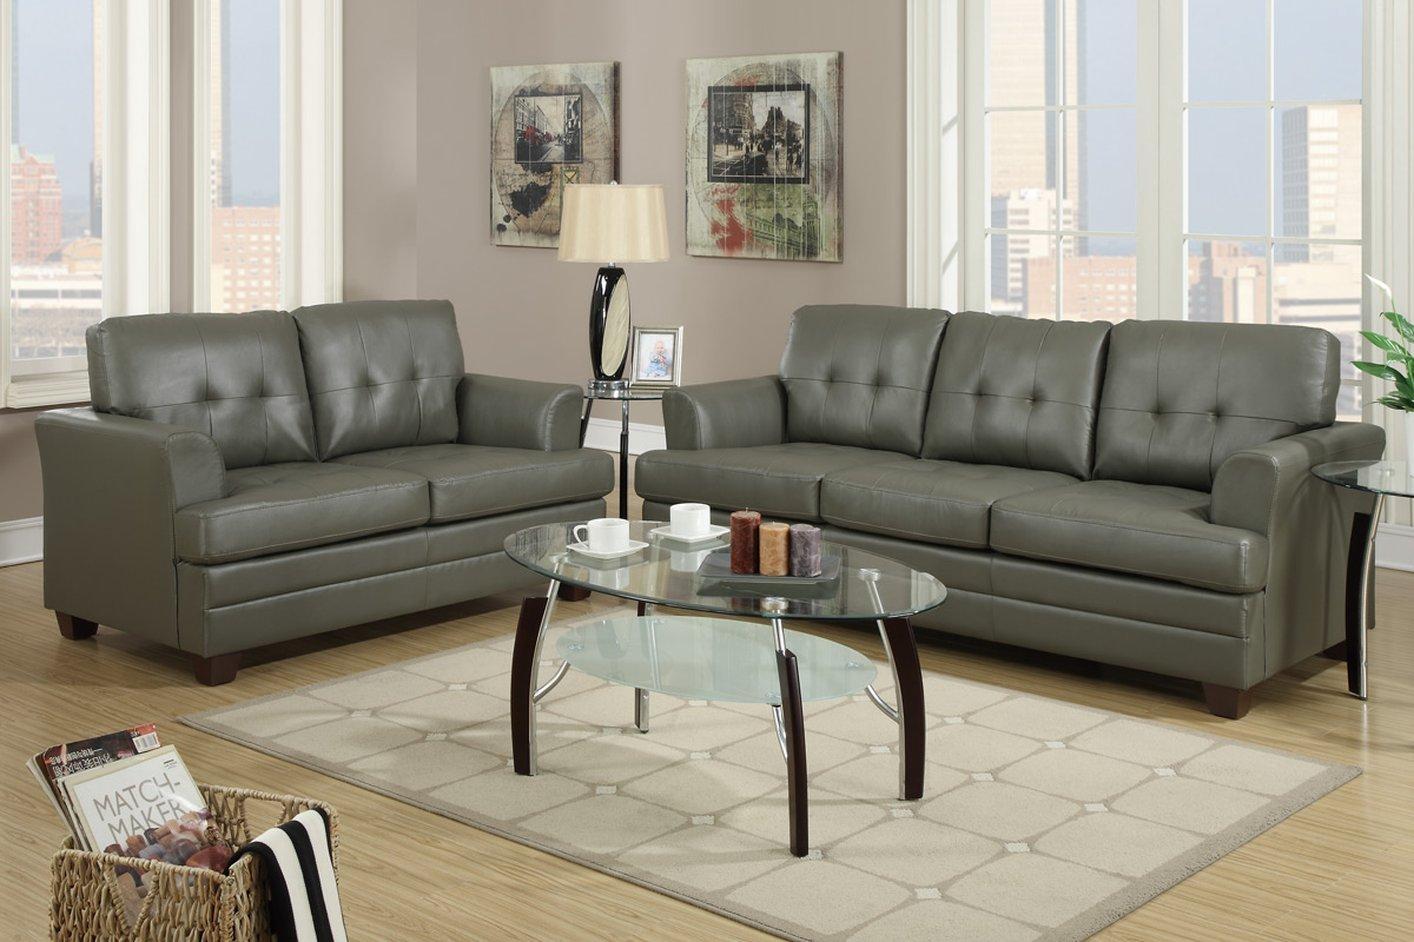 Black Leather Sofa And Loveseat Set | Tehranmix Decoration Throughout Black Leather Sofas And Loveseat Sets (Image 9 of 20)